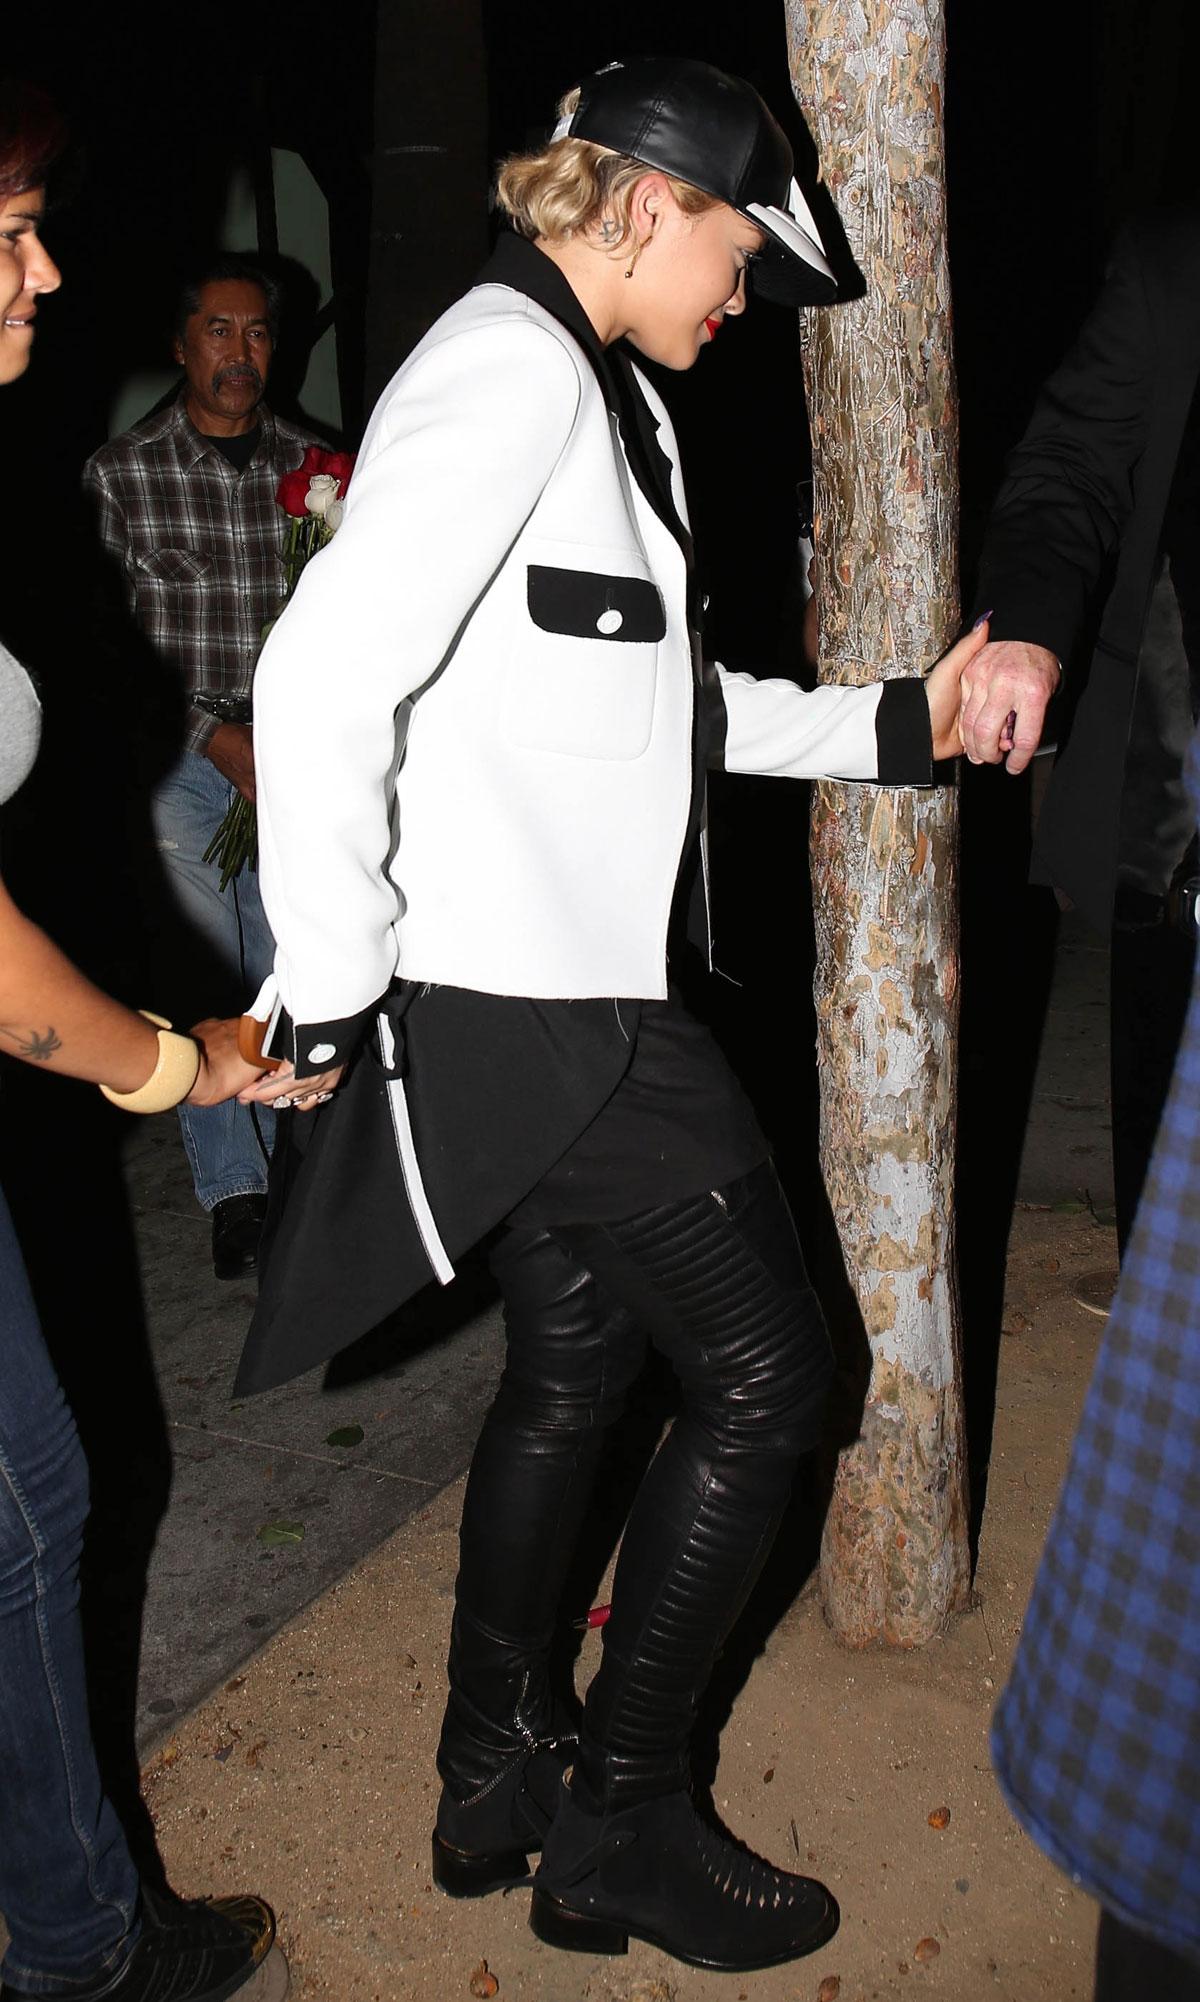 Rita Ora arriving at LAX airport